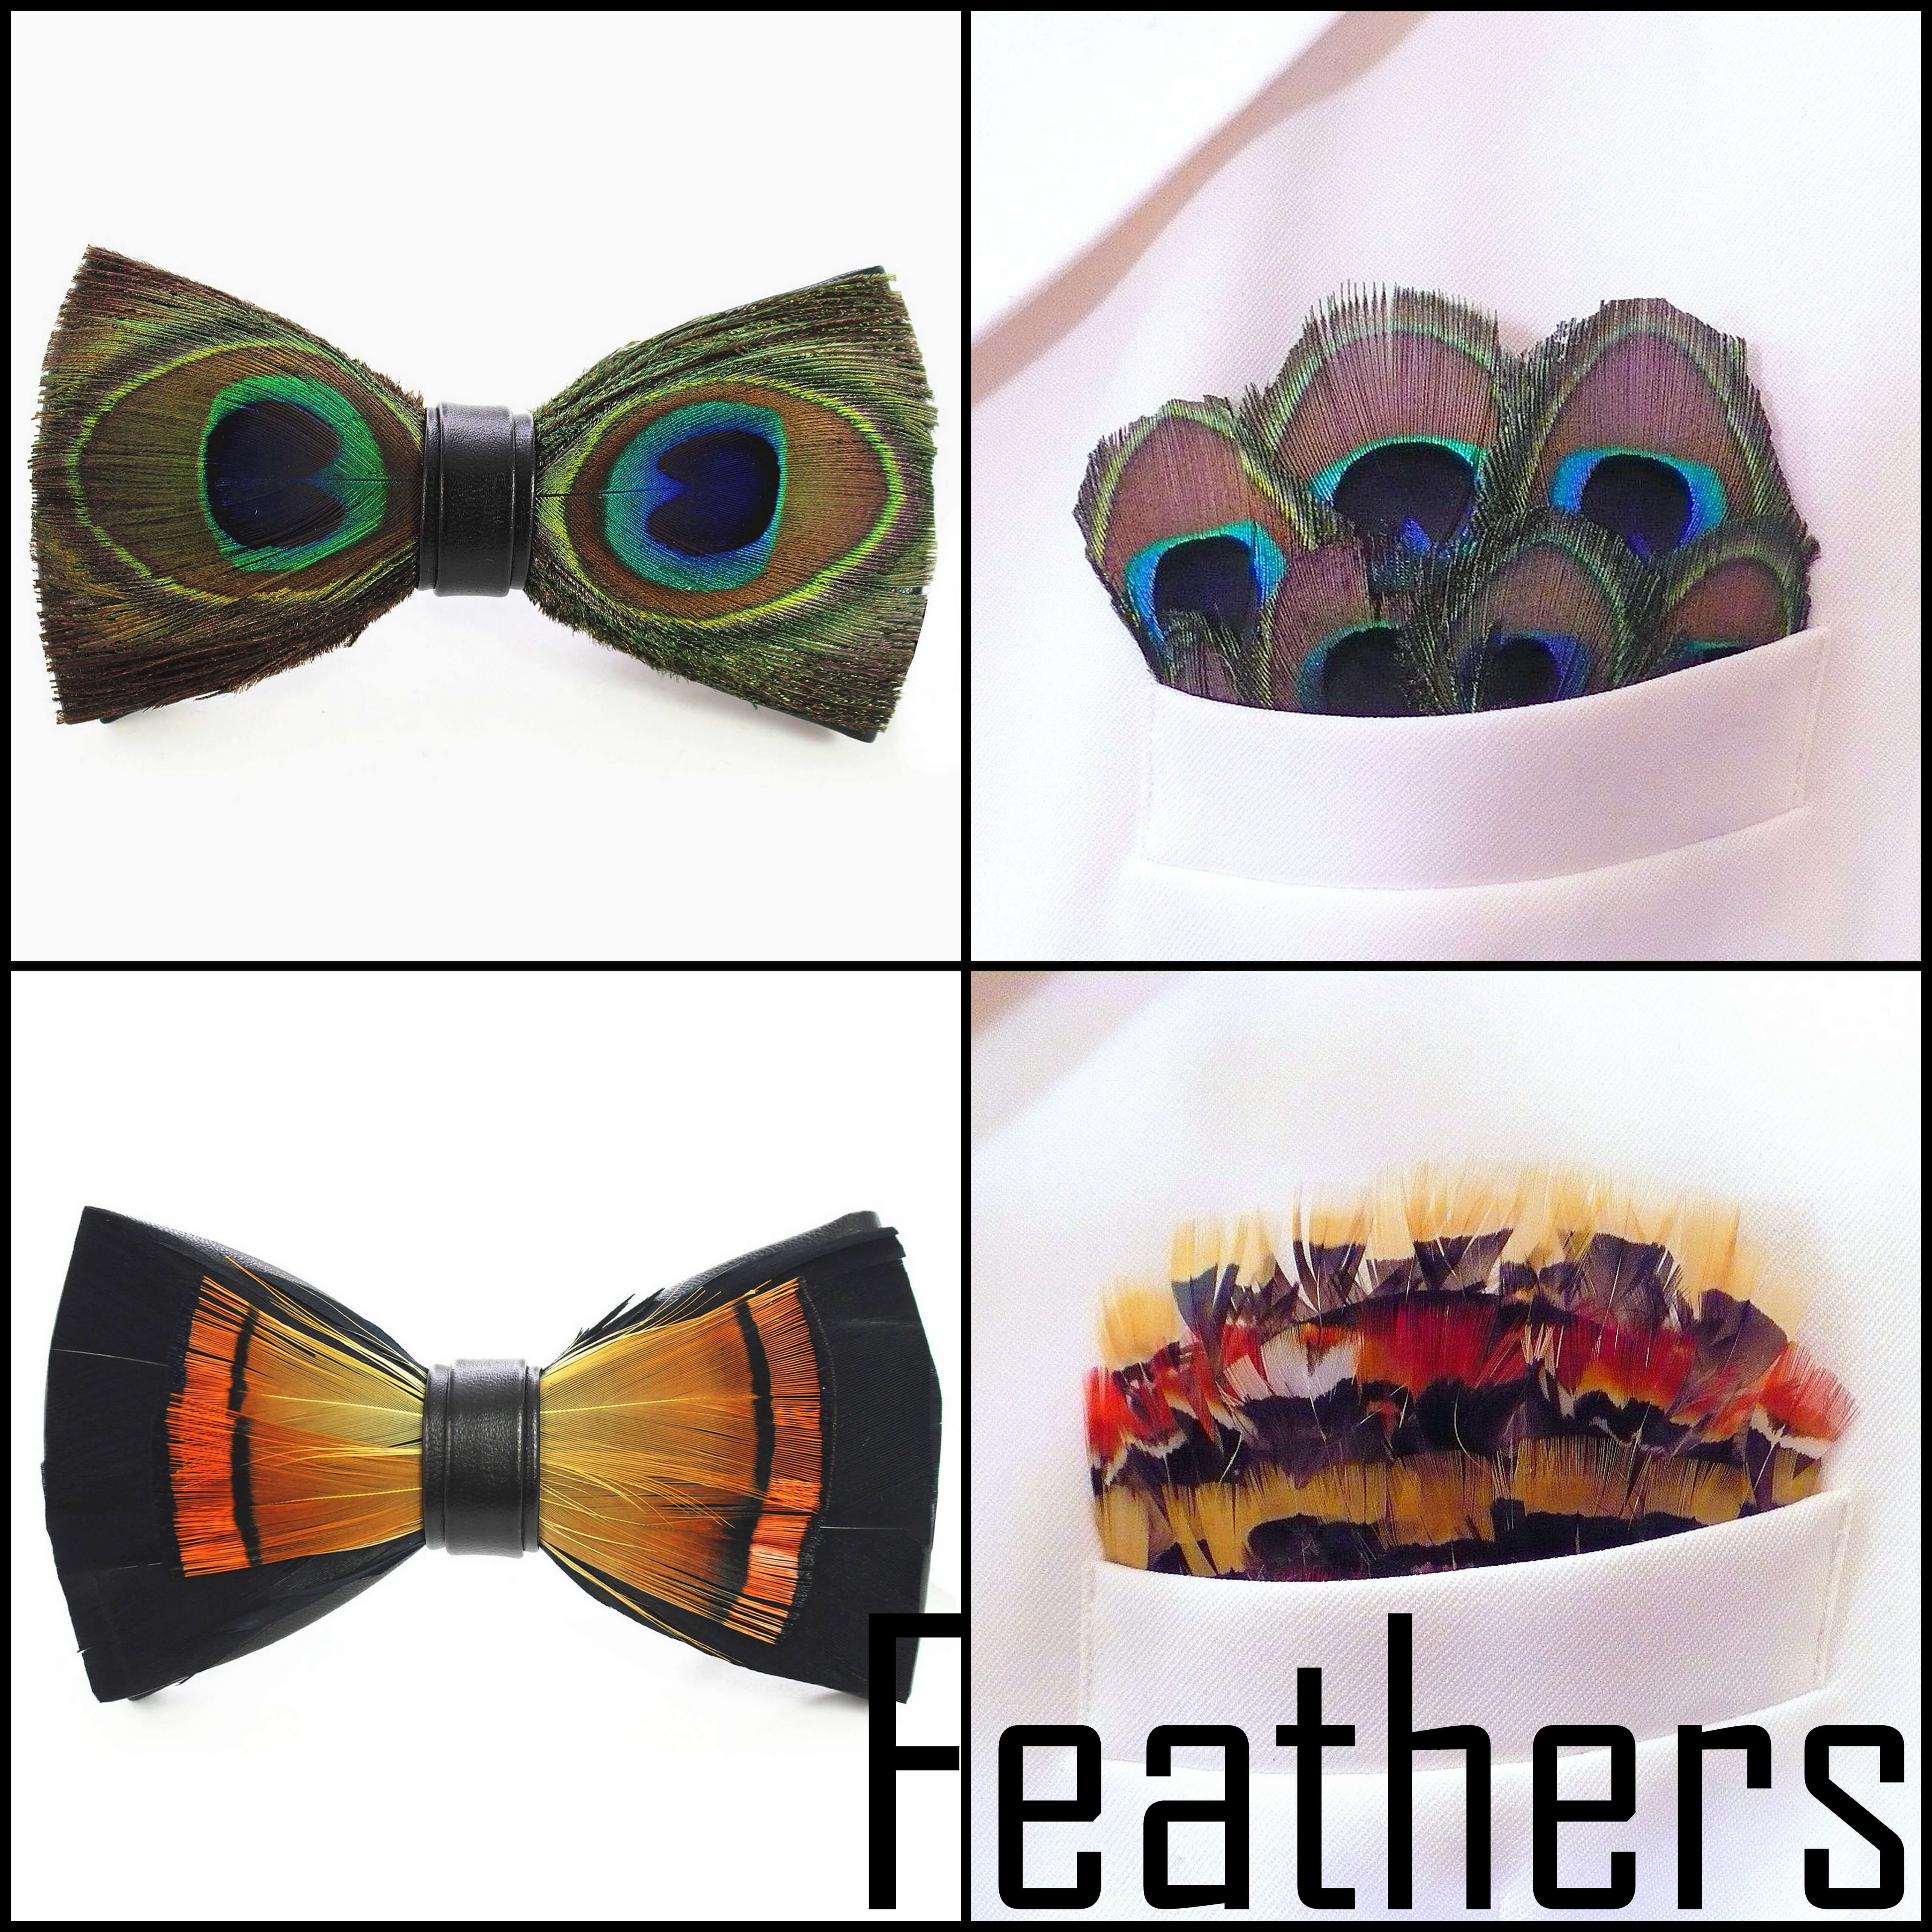 feather-1-pix.jpg